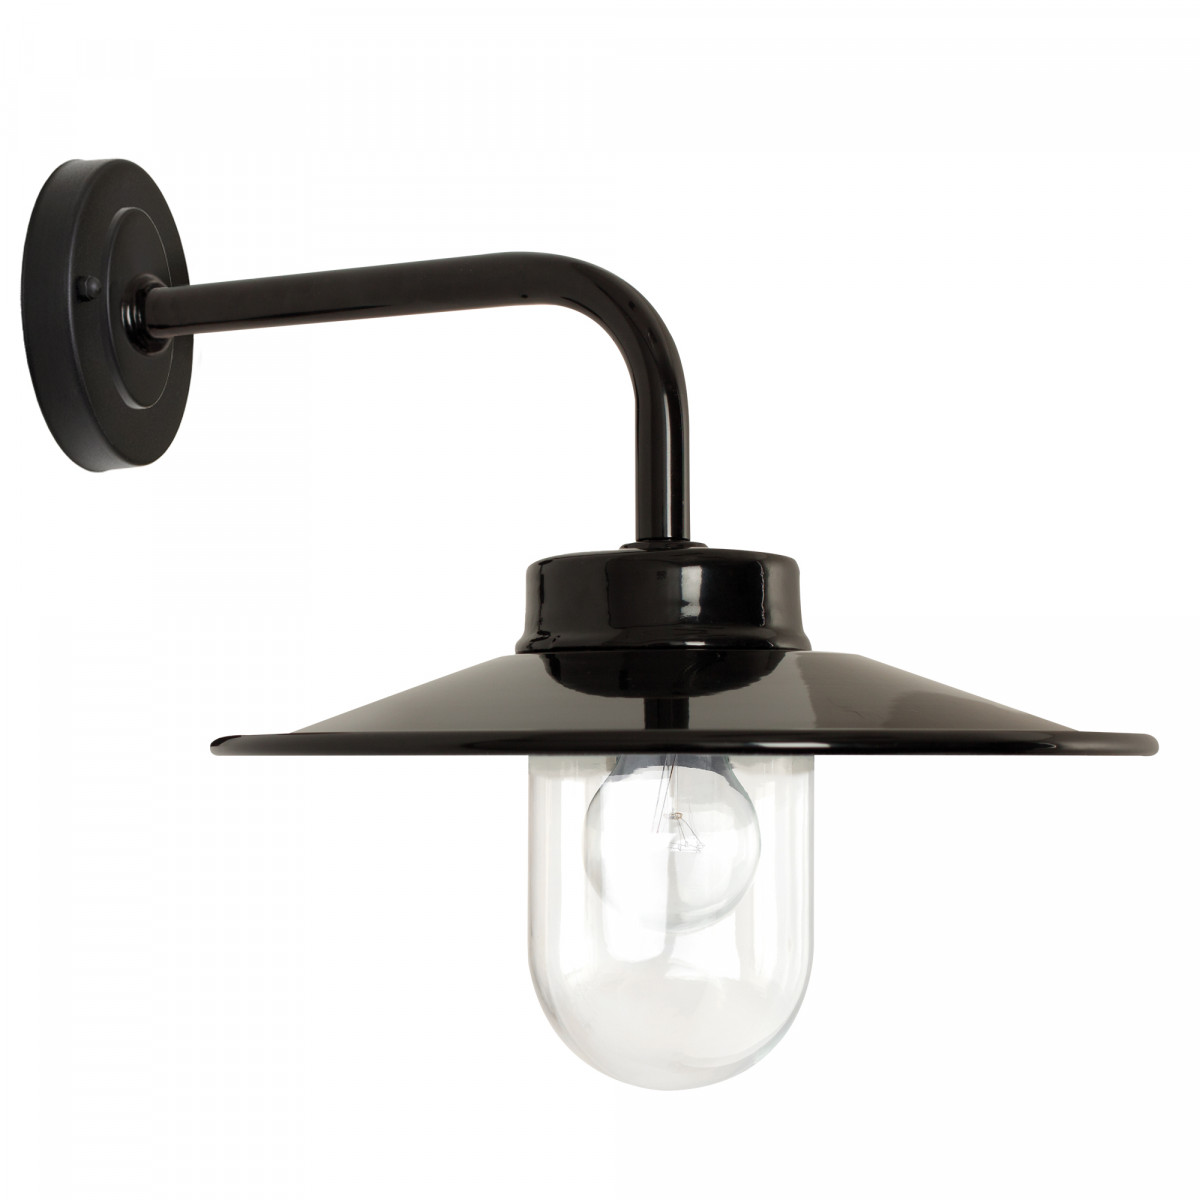 Buitenlamp Vita Dag Nacht sensor LED Schemersensor